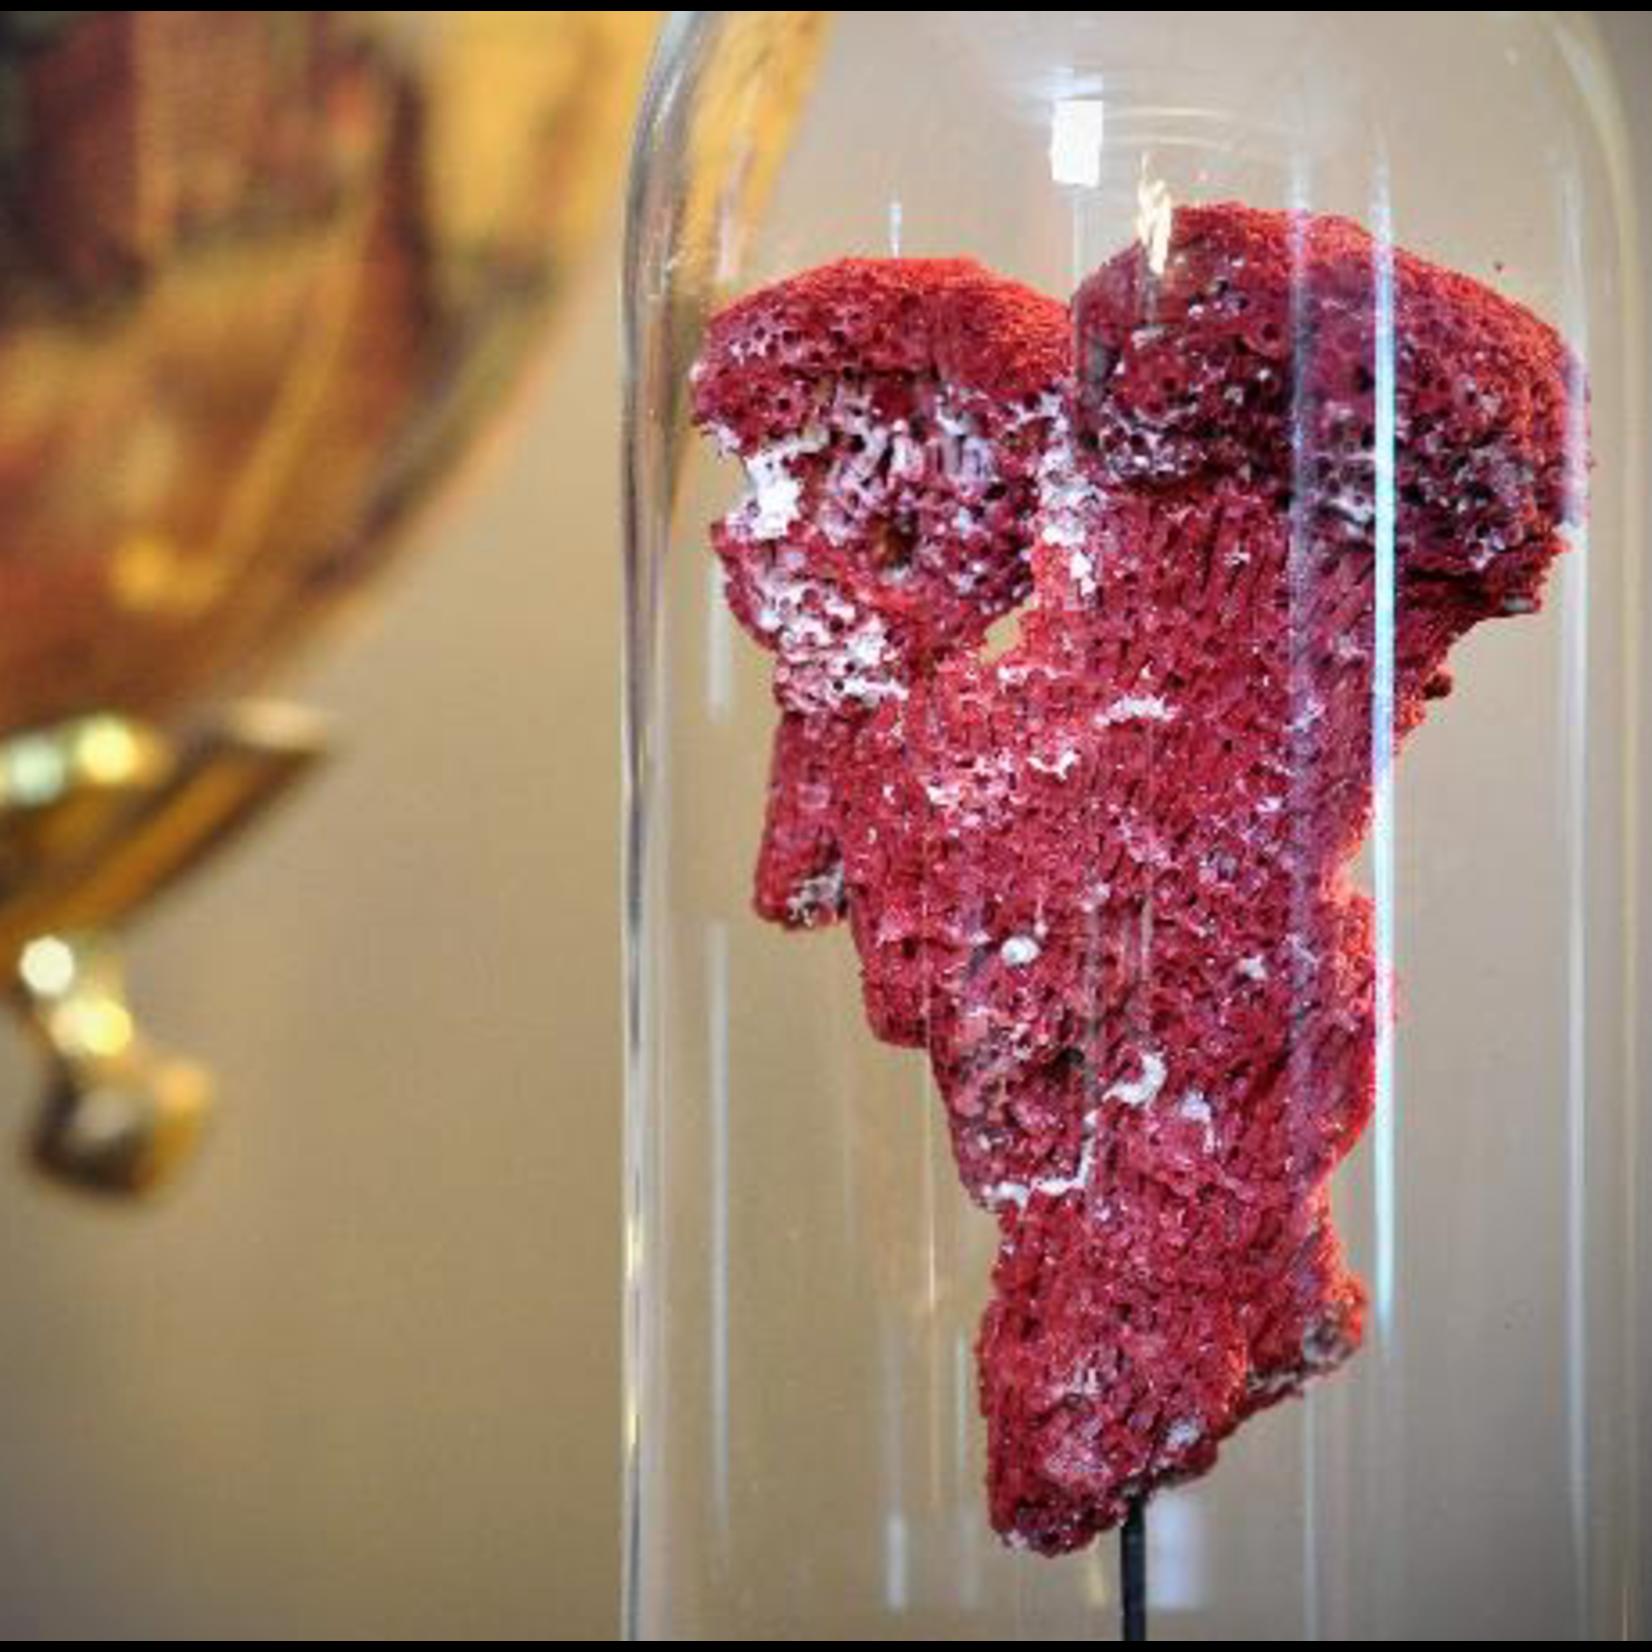 OBJET DE CURIOSITE RED TUBIPORA UNDER GLASS